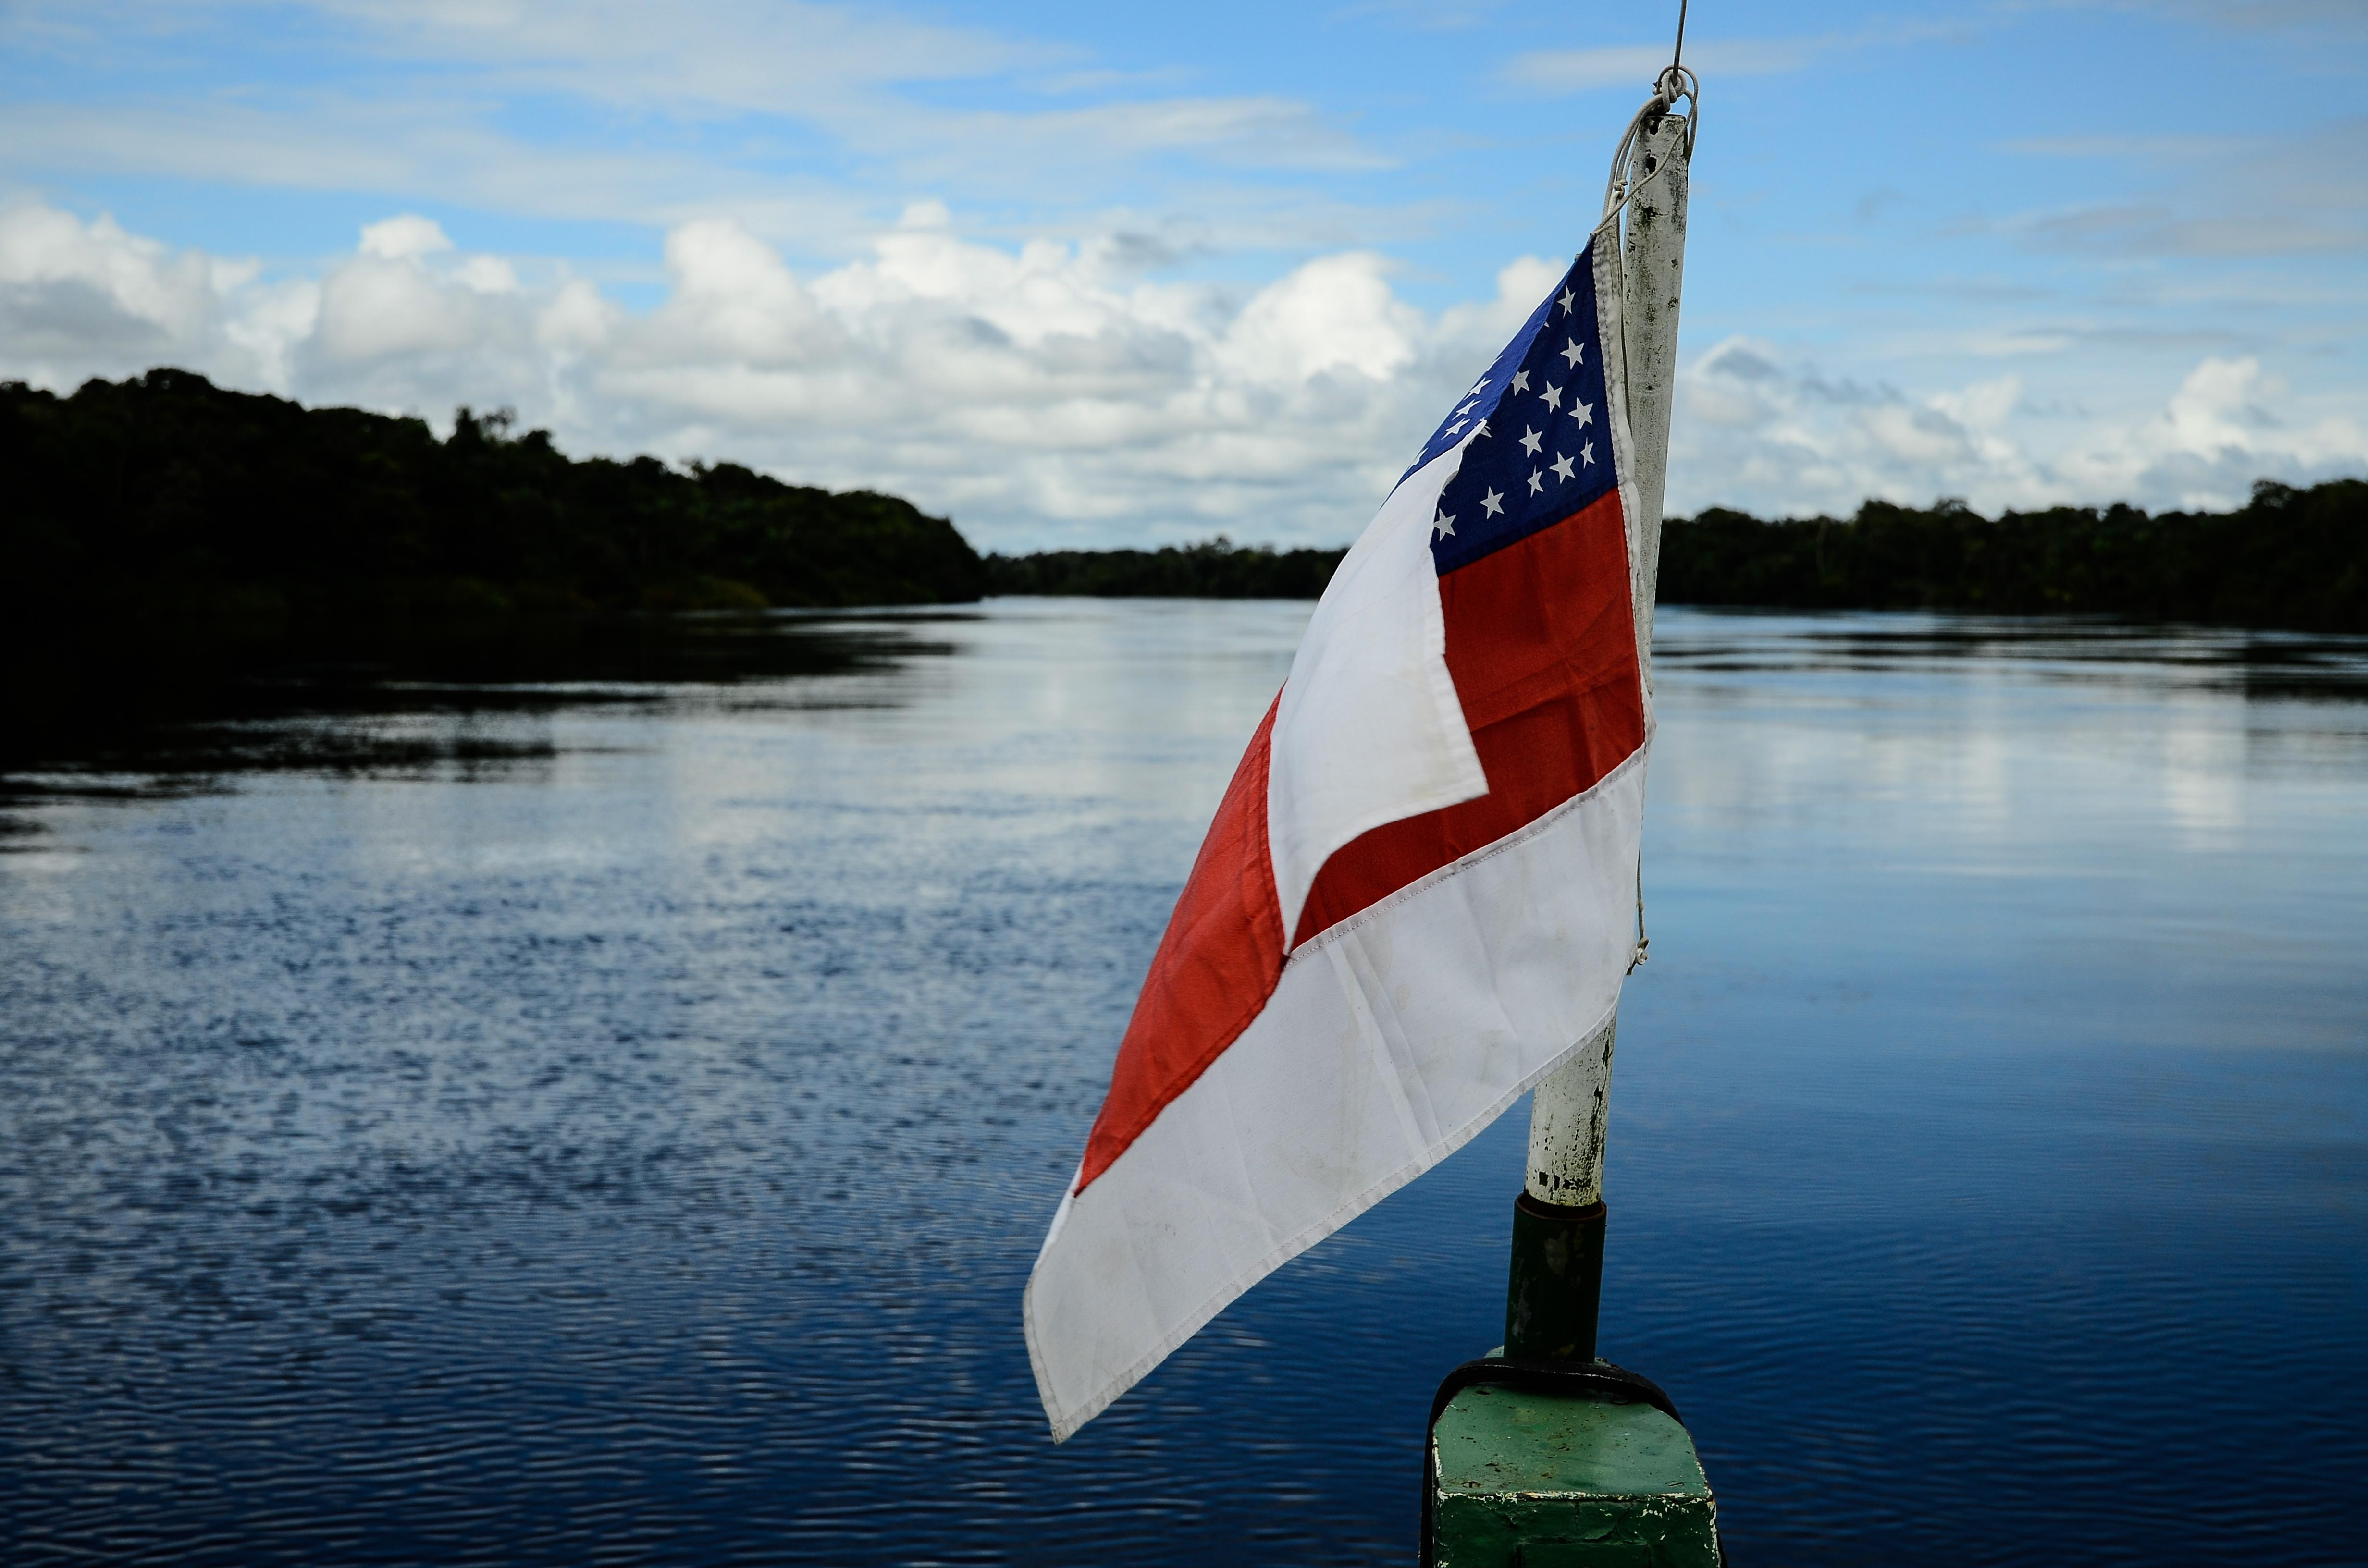 Amazonas State Flag on boat into Rio Unini.